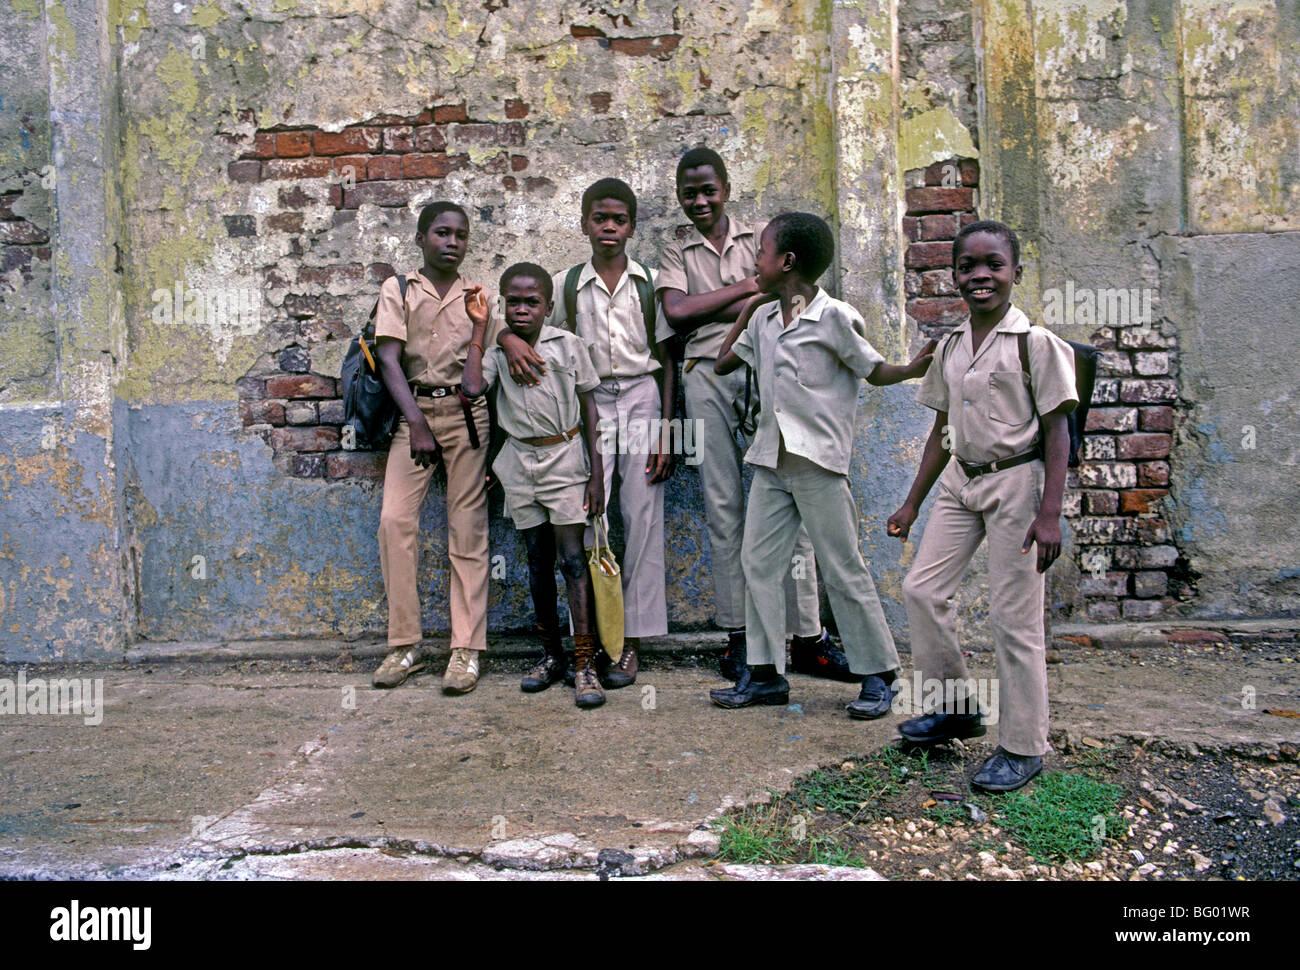 Jamaican boys, schoolboys, schoolchildren, students, elementary school, Spanish Town, Jamaica, Caribbean, West Indies - Stock Image